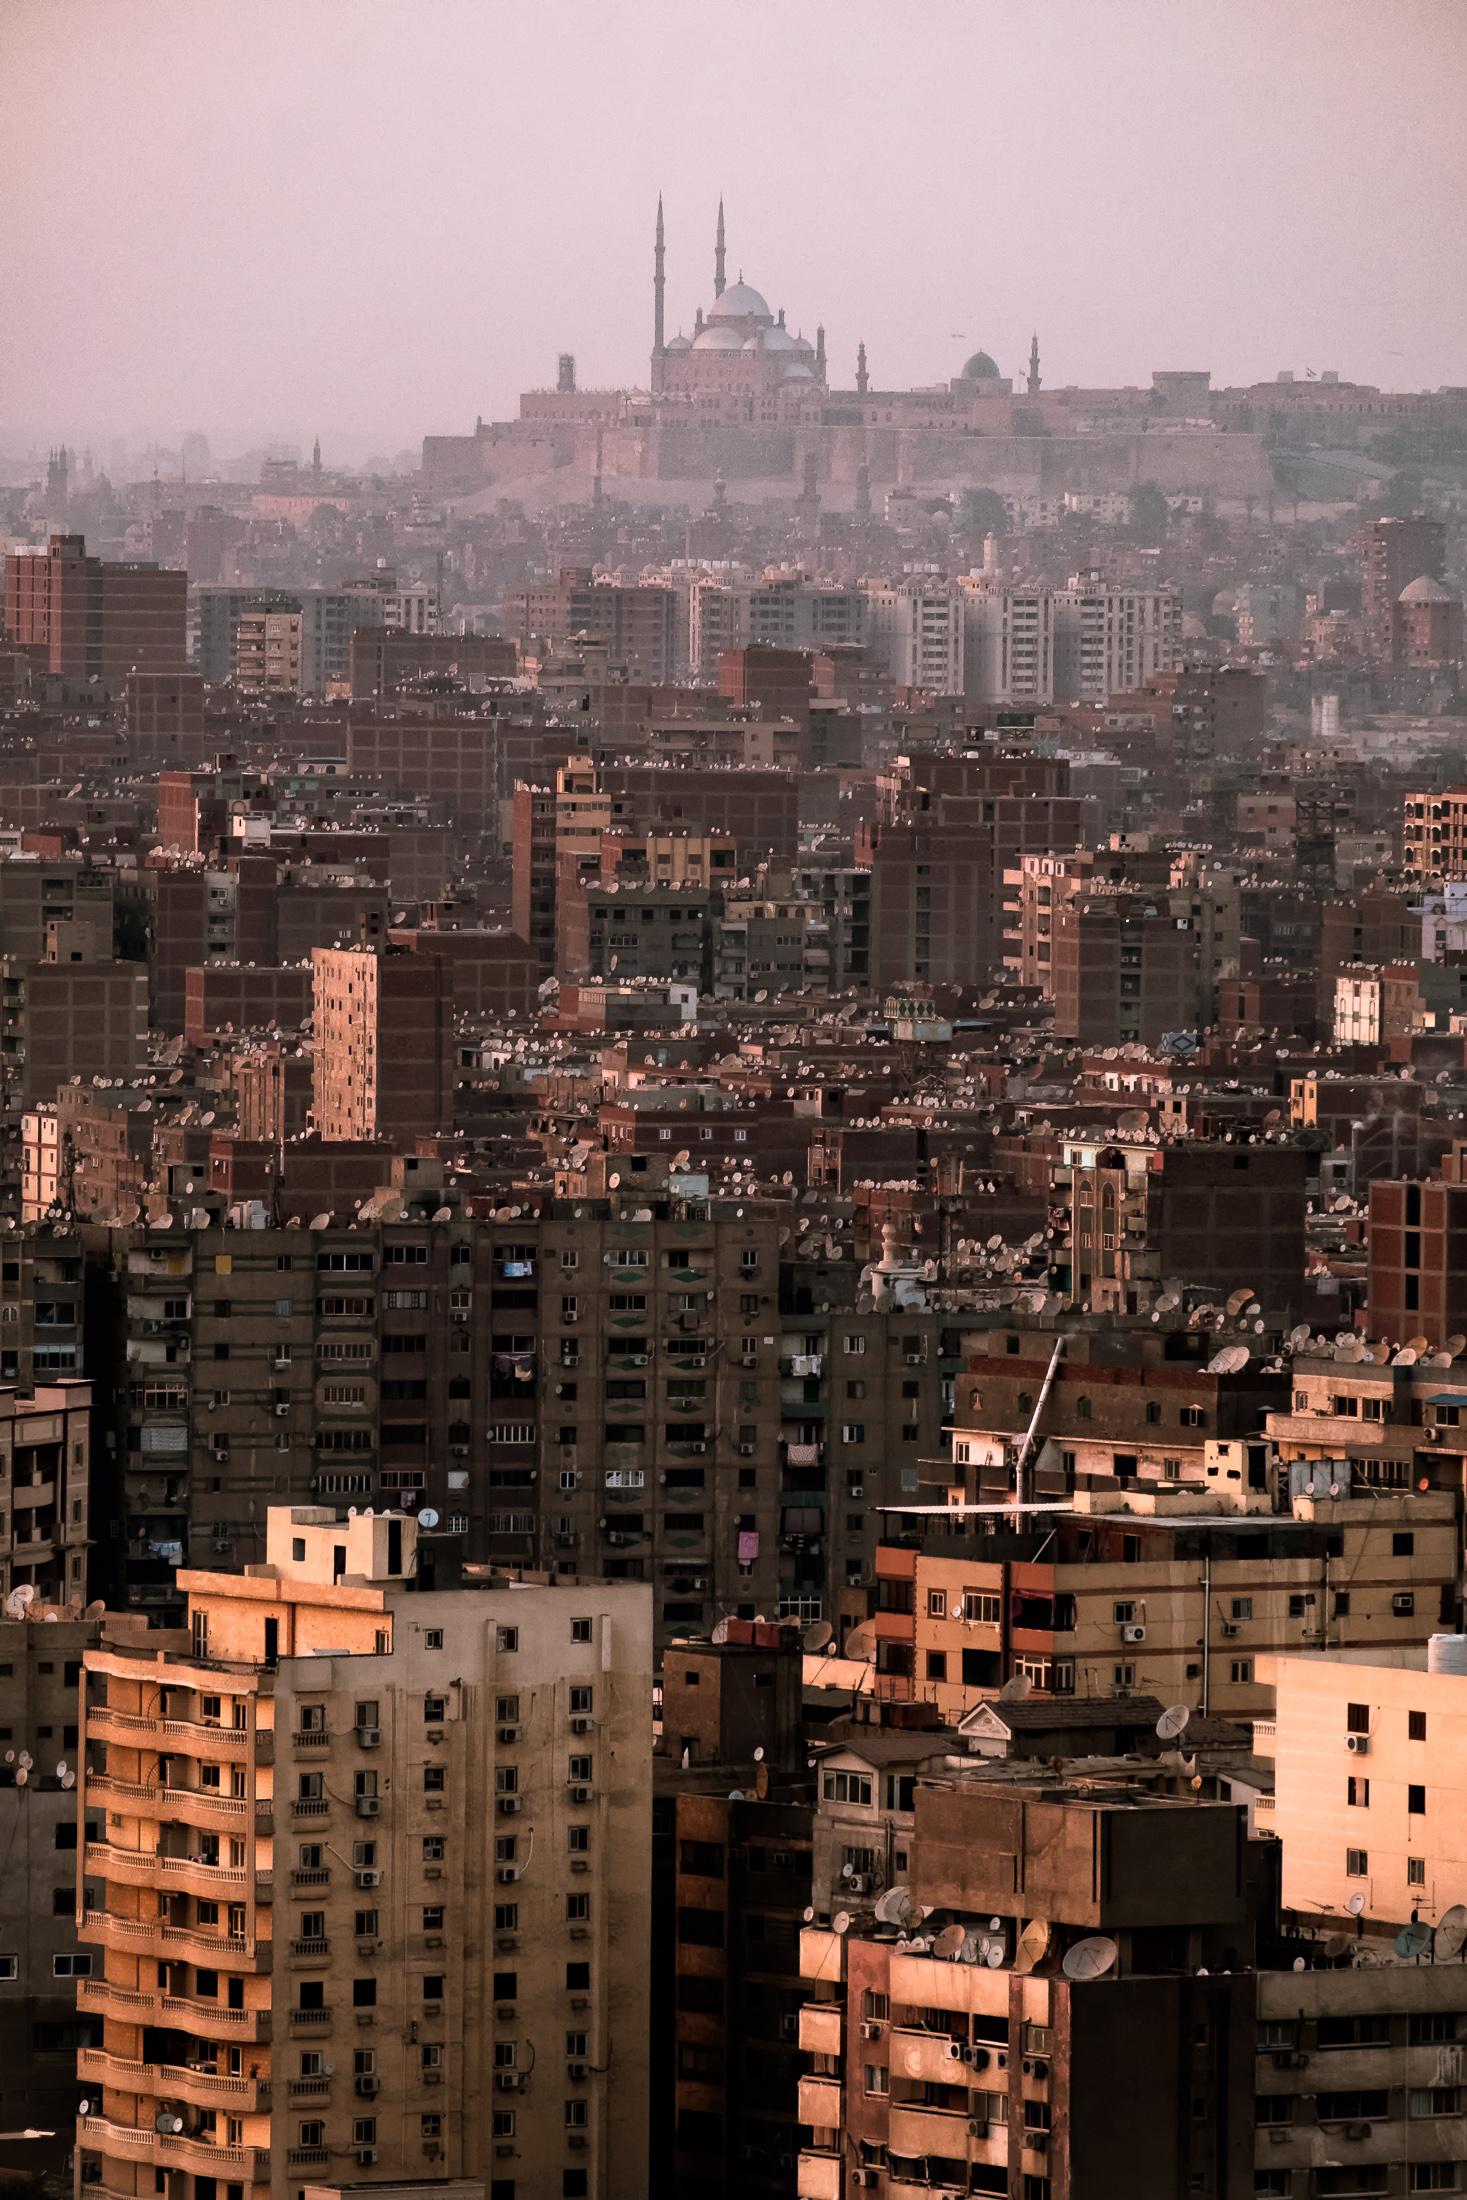 2018.05.11_Egypt_4975_2200px.jpg